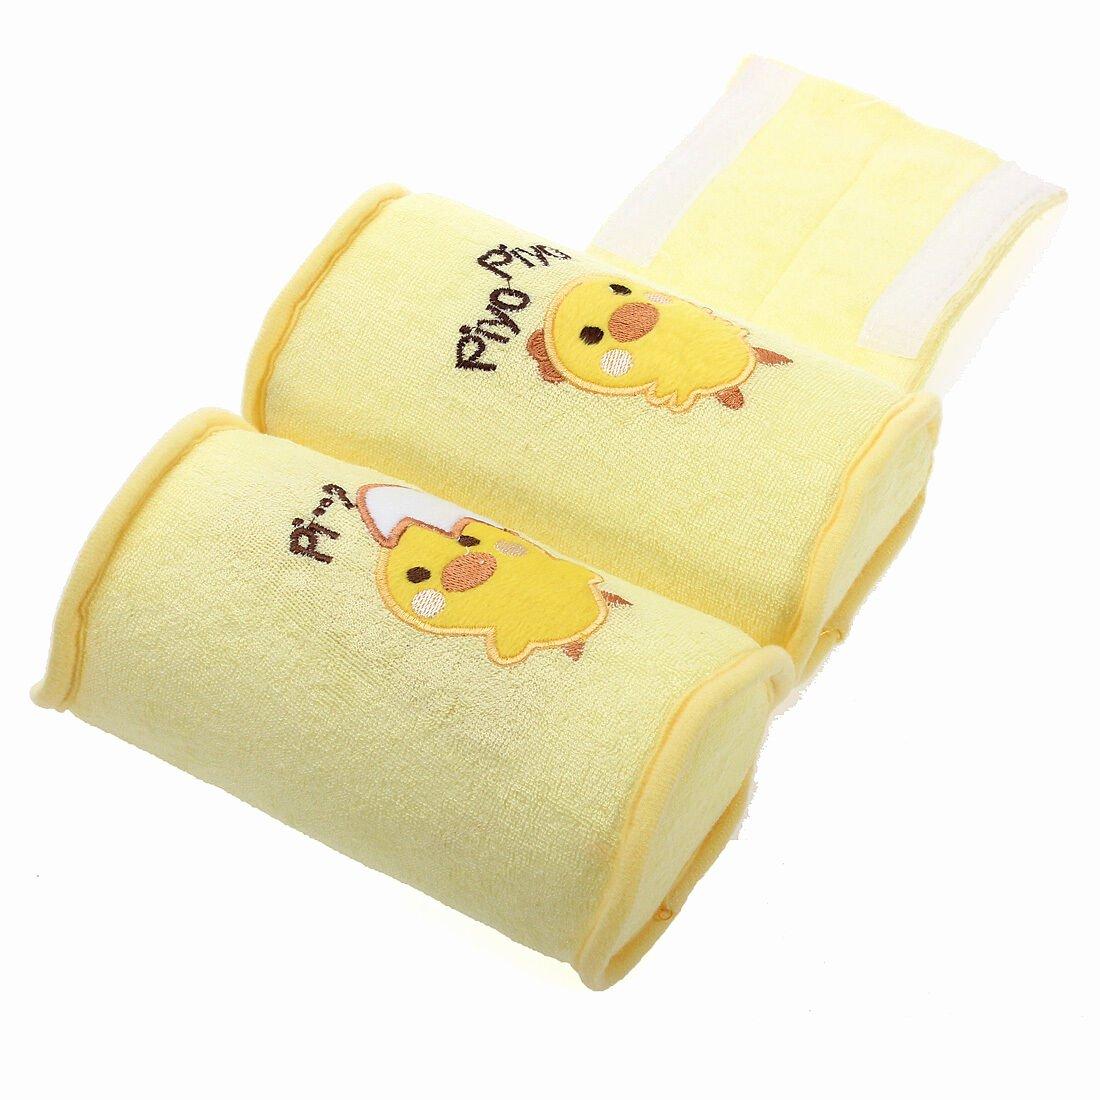 Babies R Us Sleep Positioner New New Baby Infant Safe Sleep Positioner Prevent Flat Head